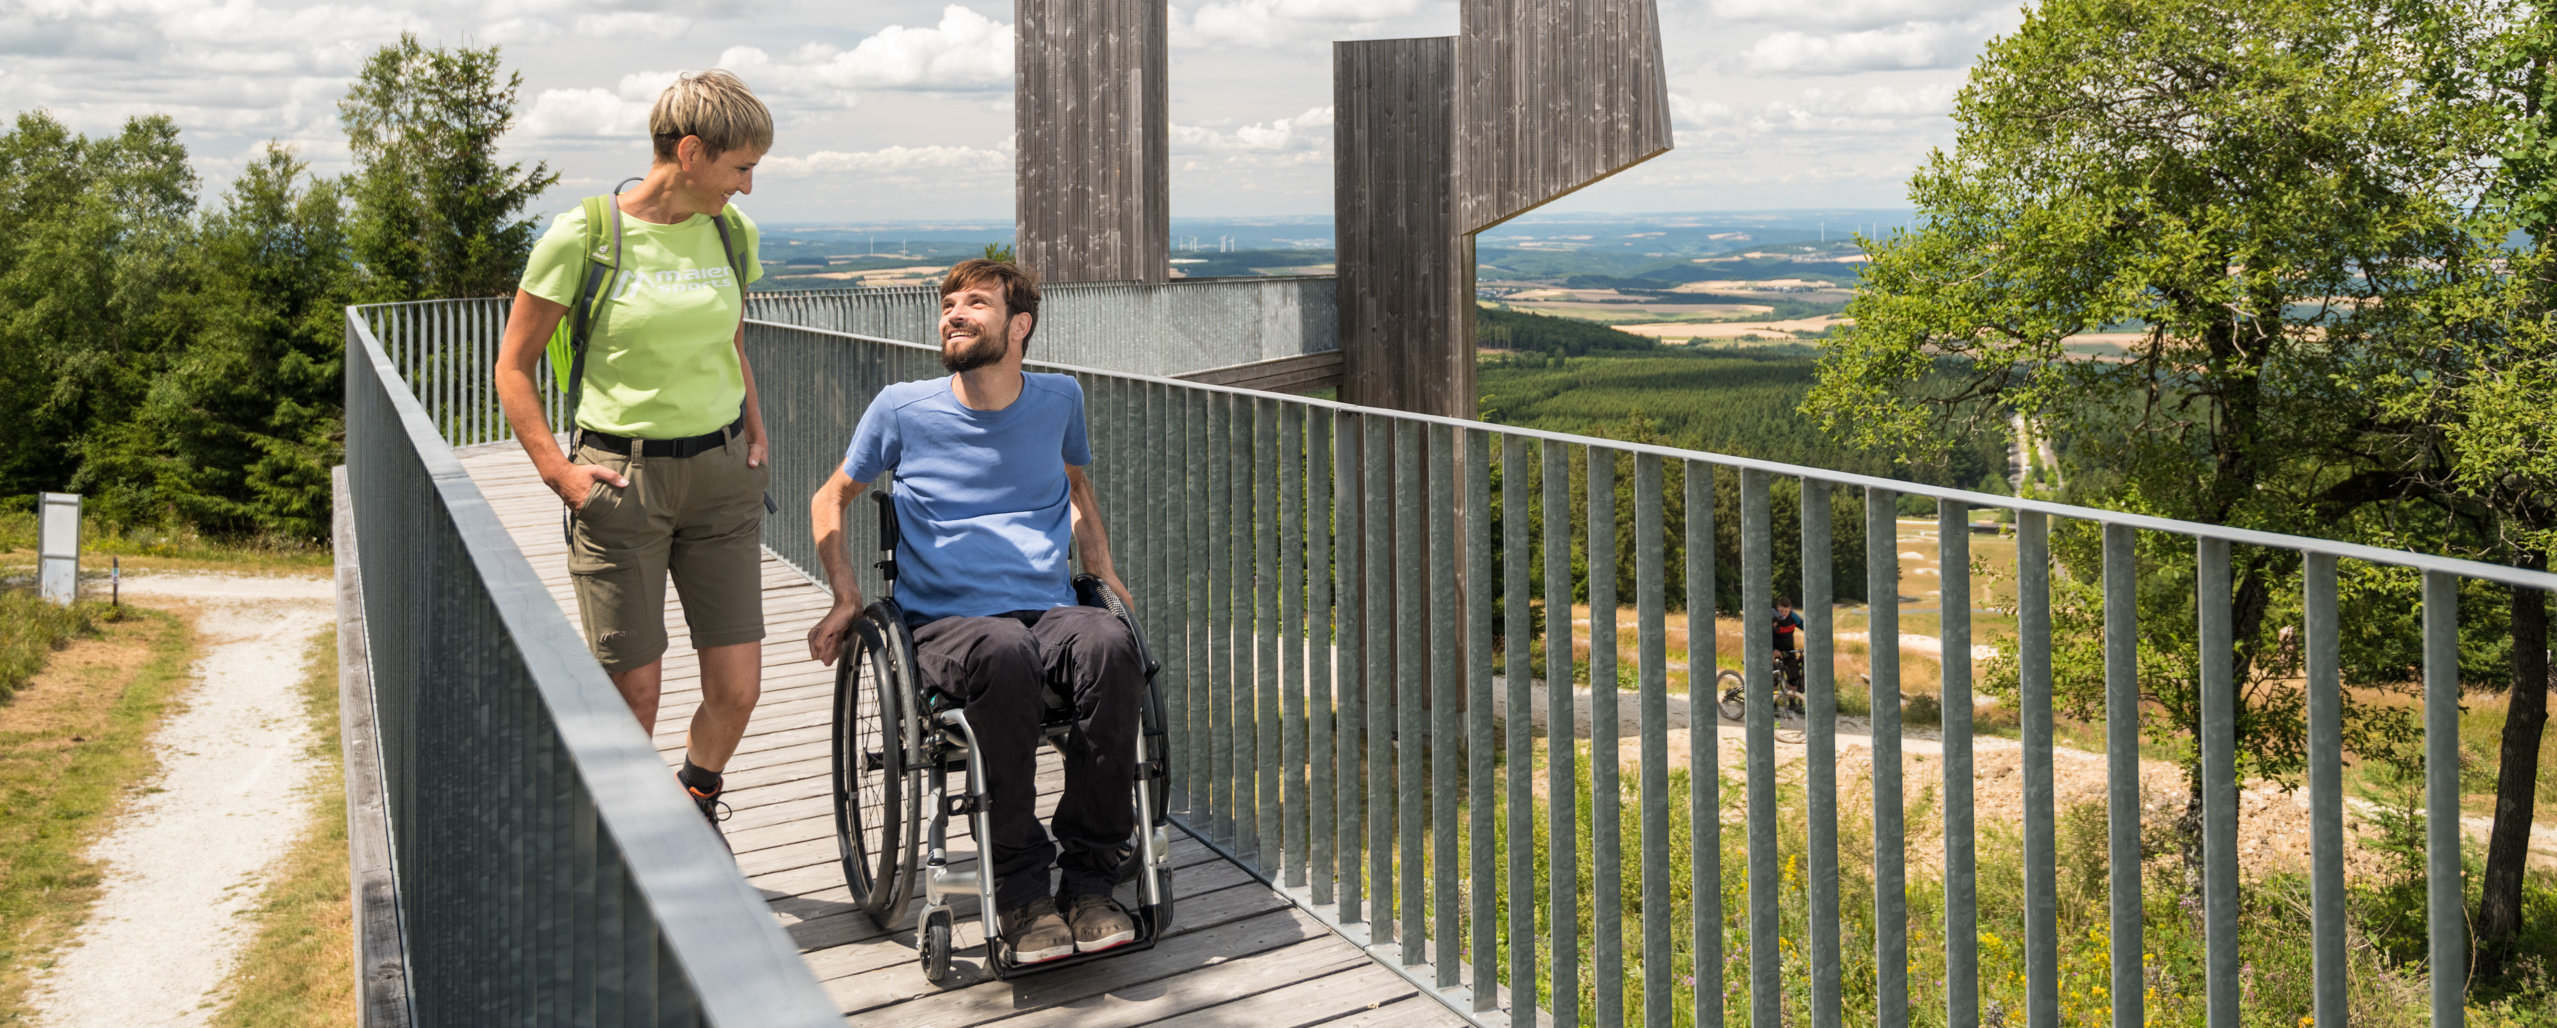 Accessible Windklang viewing platform on the Erbeskopf in Hunsrück